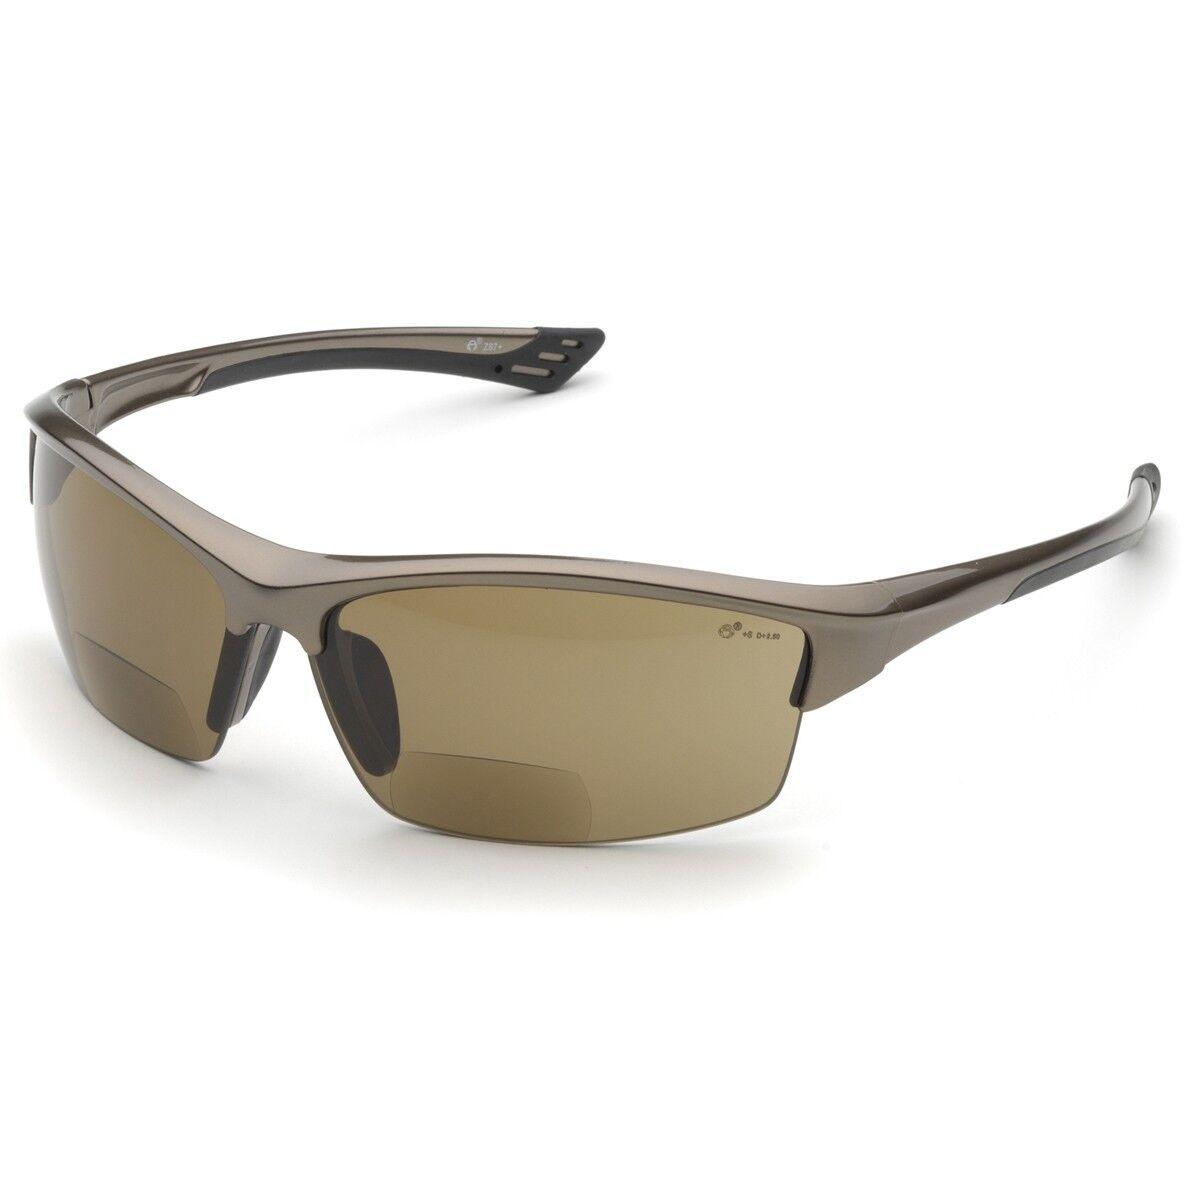 Elvex Bifocal Safety Glasses with 2.0 Brown Anti-fog Lens Bronze Frame